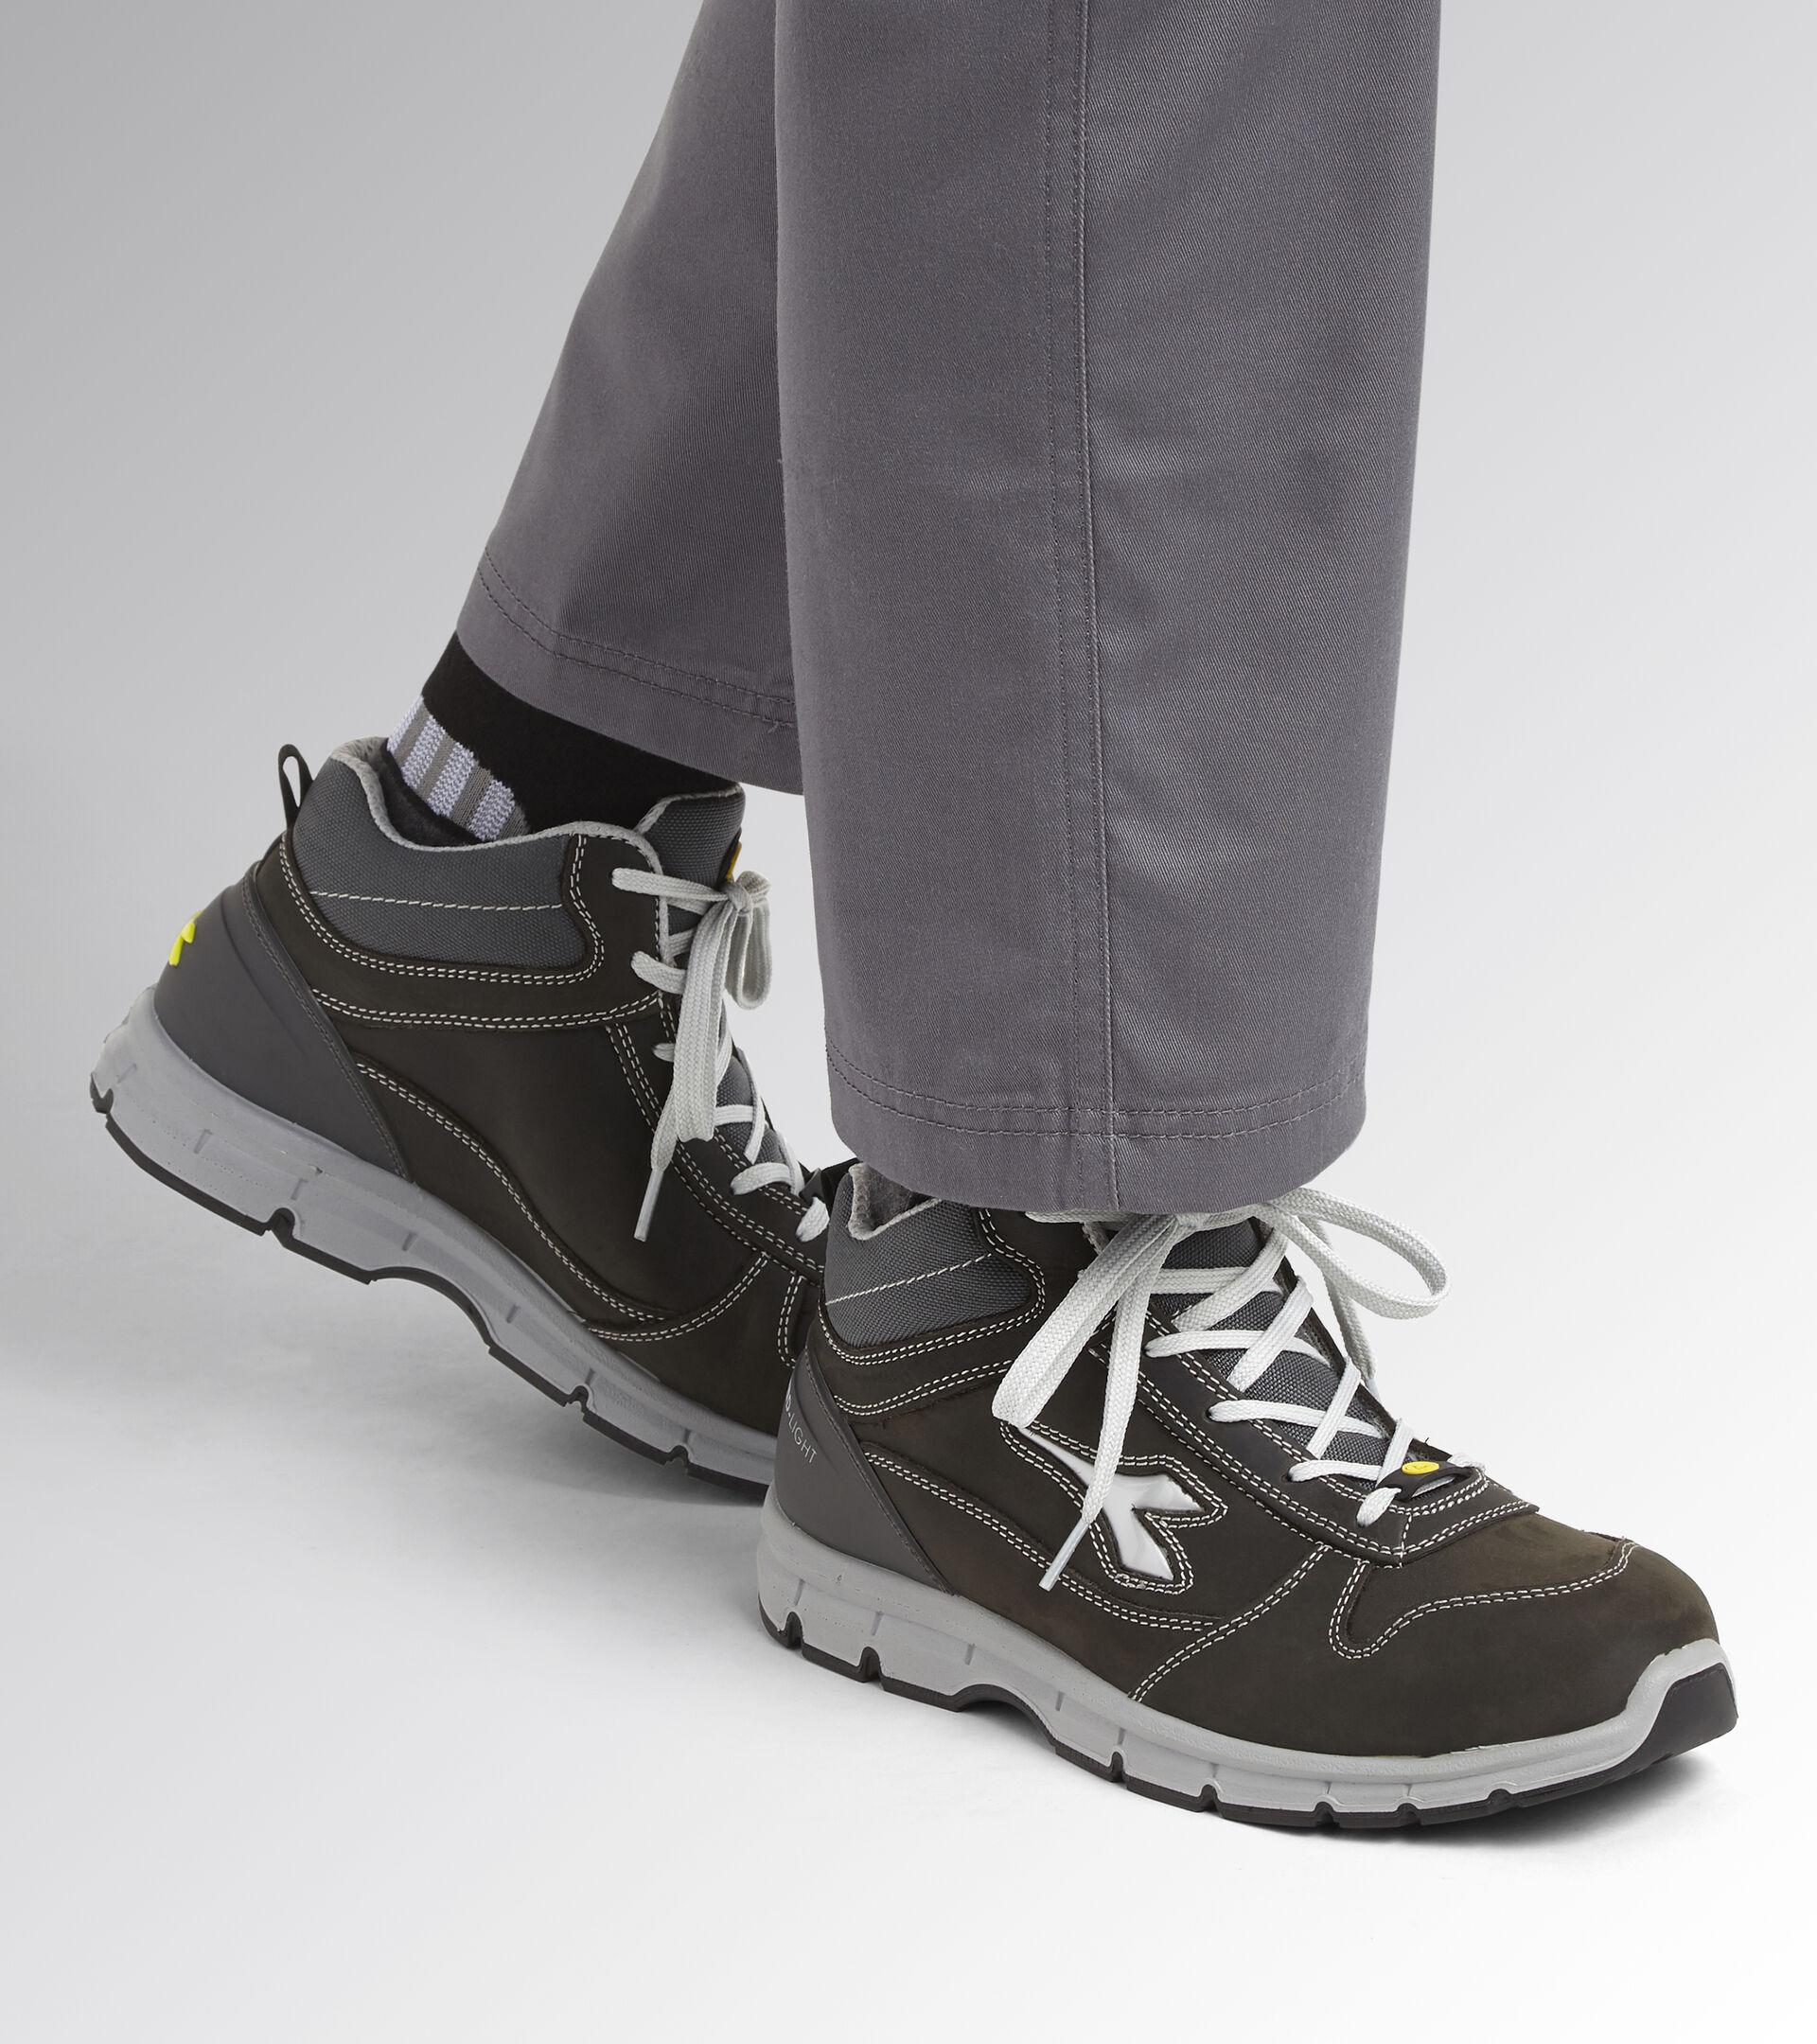 Footwear Utility UNISEX RUN MID S3 SRC ESD SCHLOSSSTEIN Utility